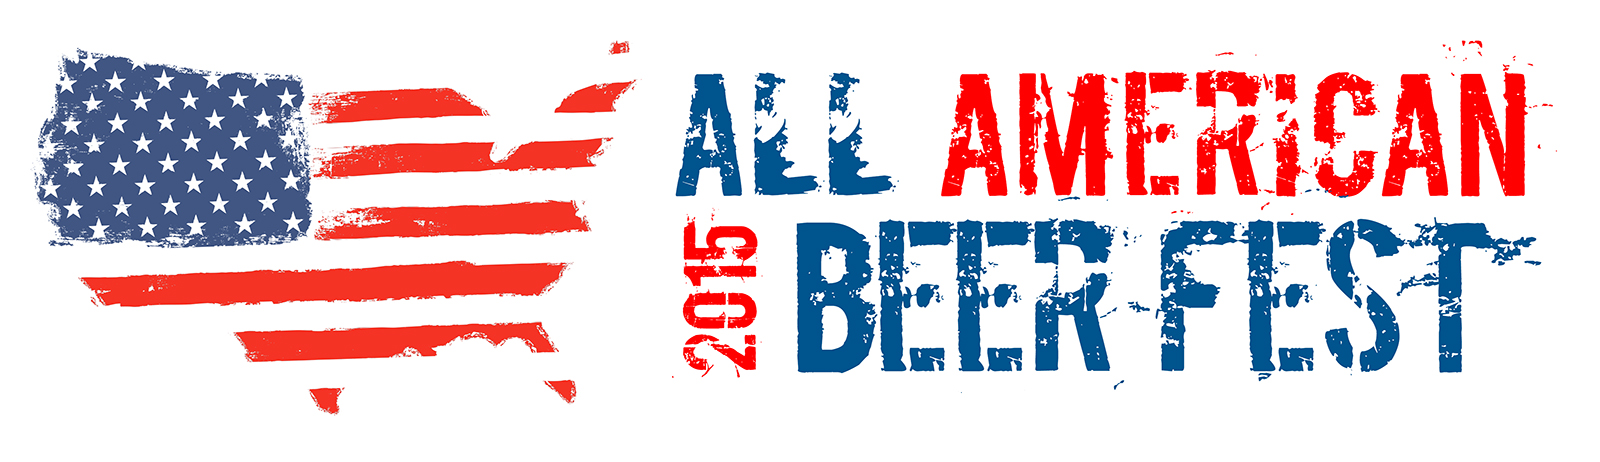 allamericanBeerFest_logo